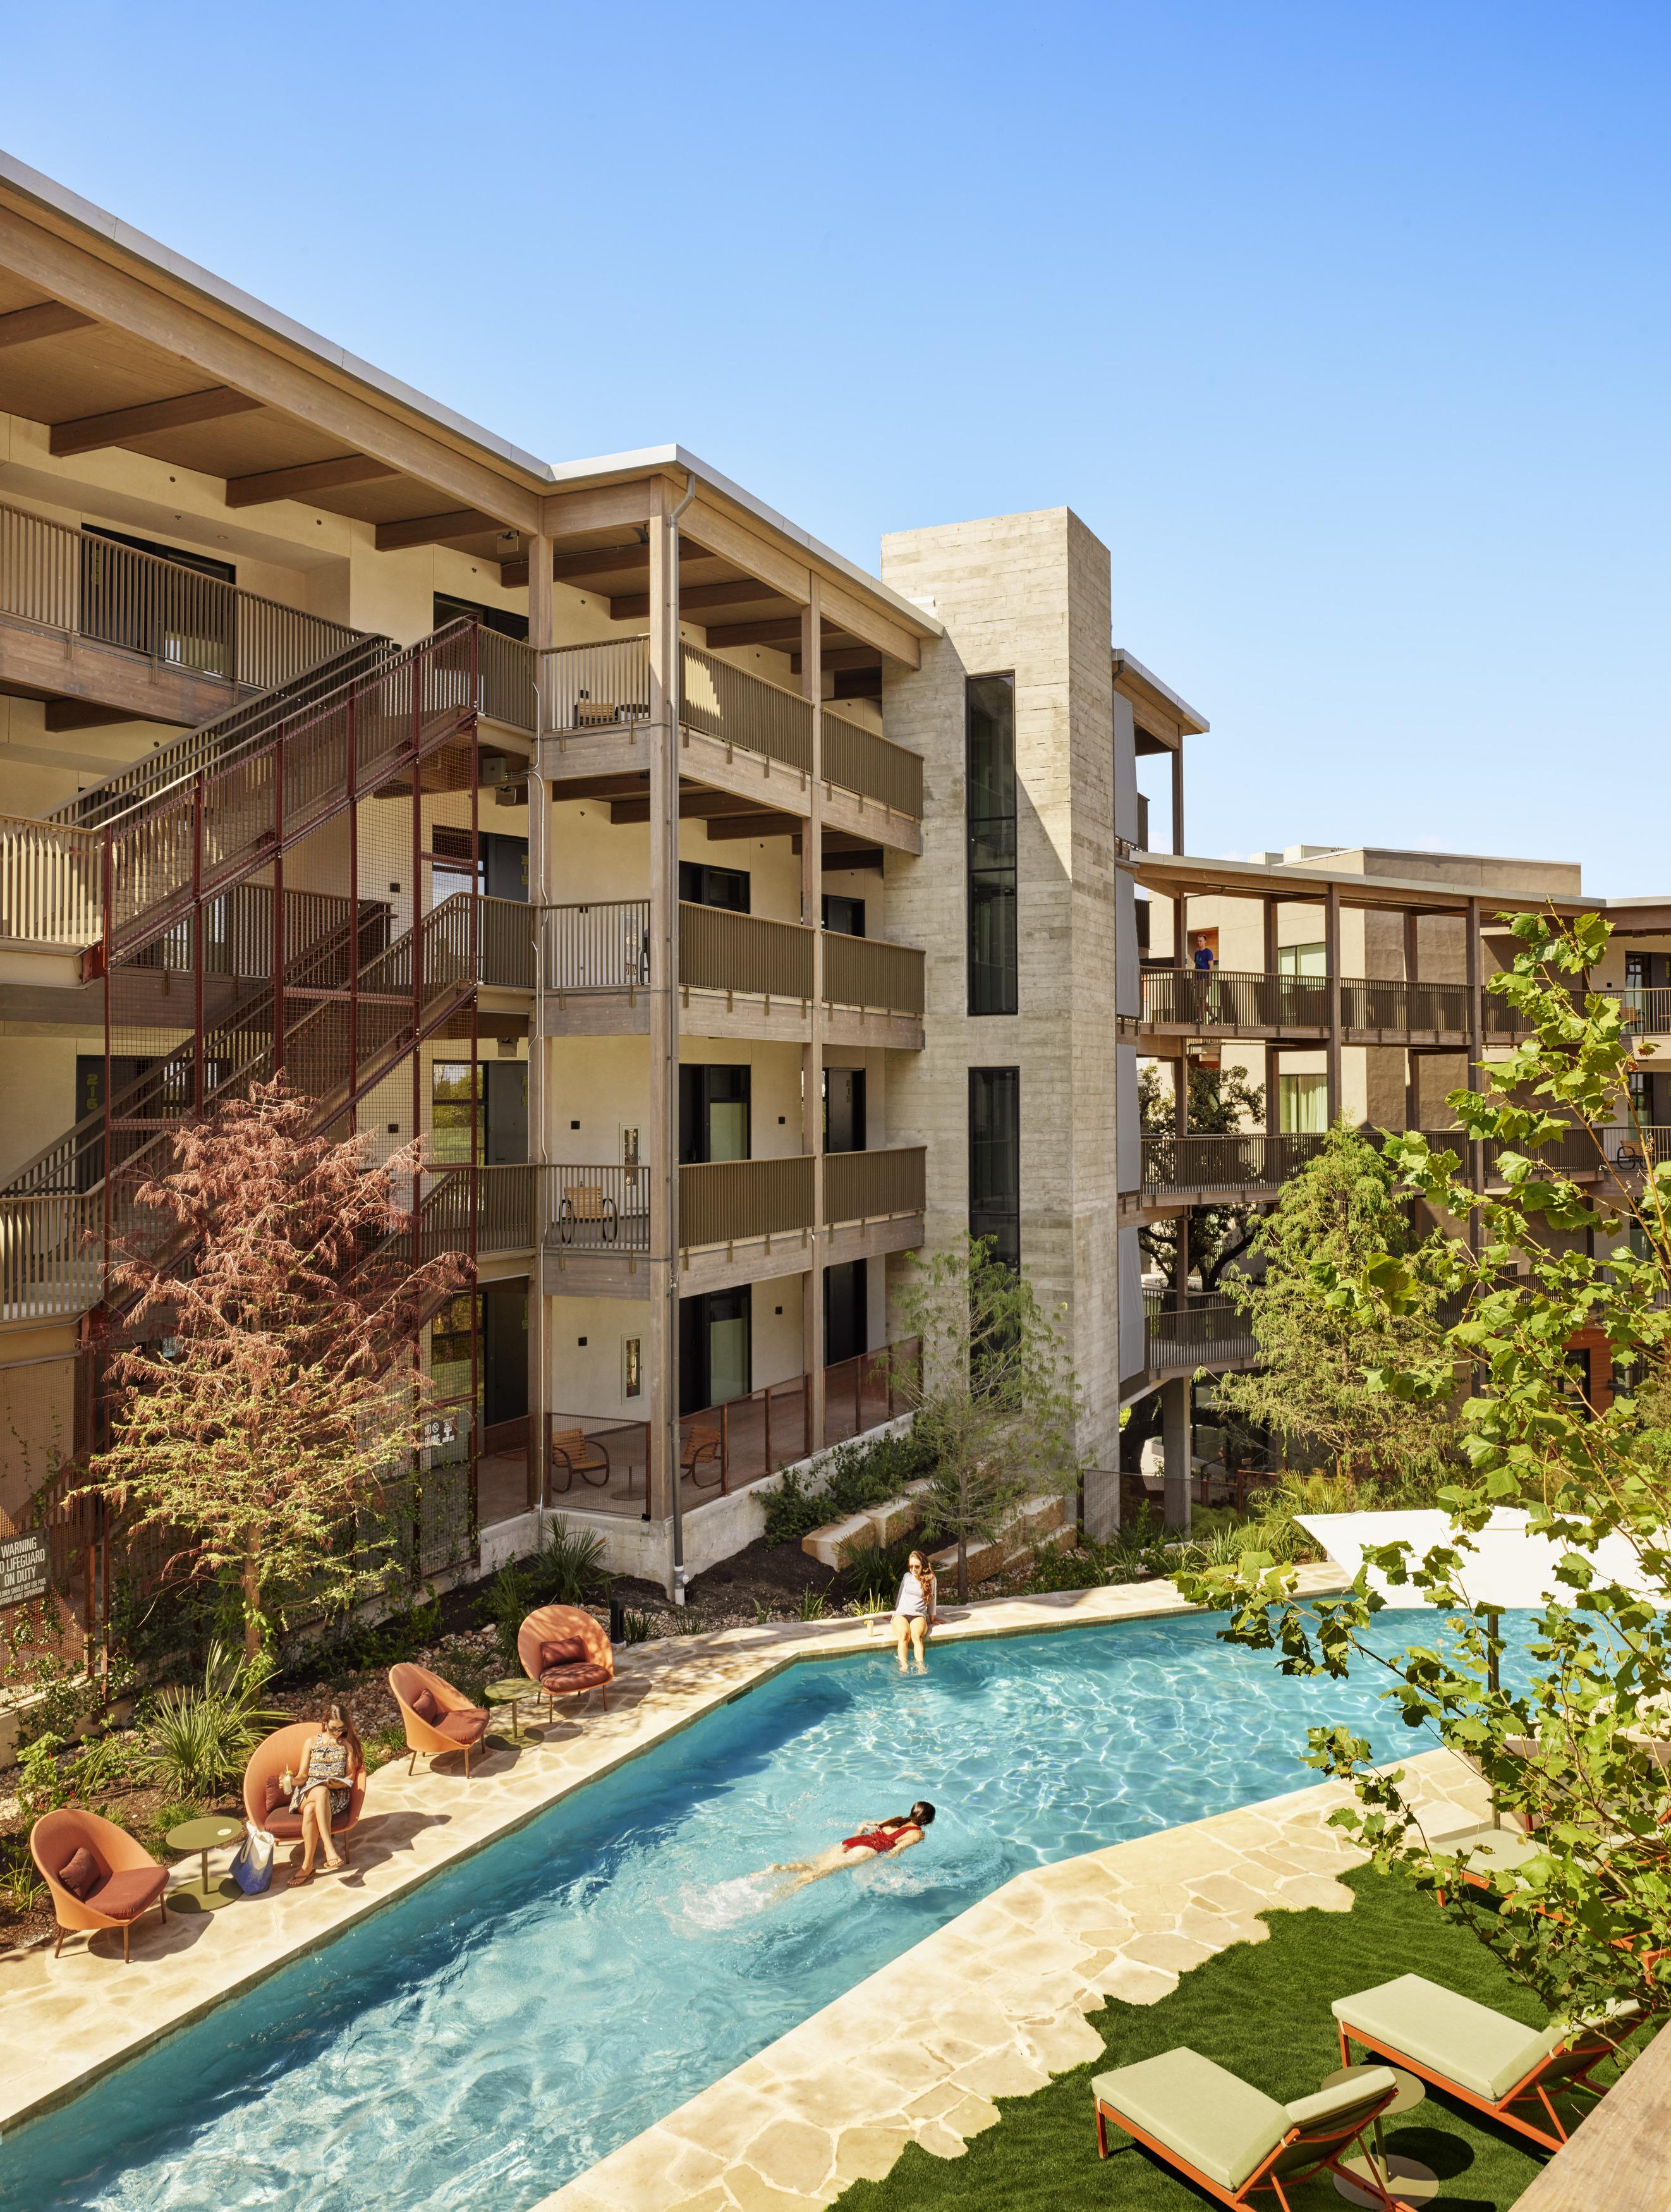 Hotel Magdalena - Pool